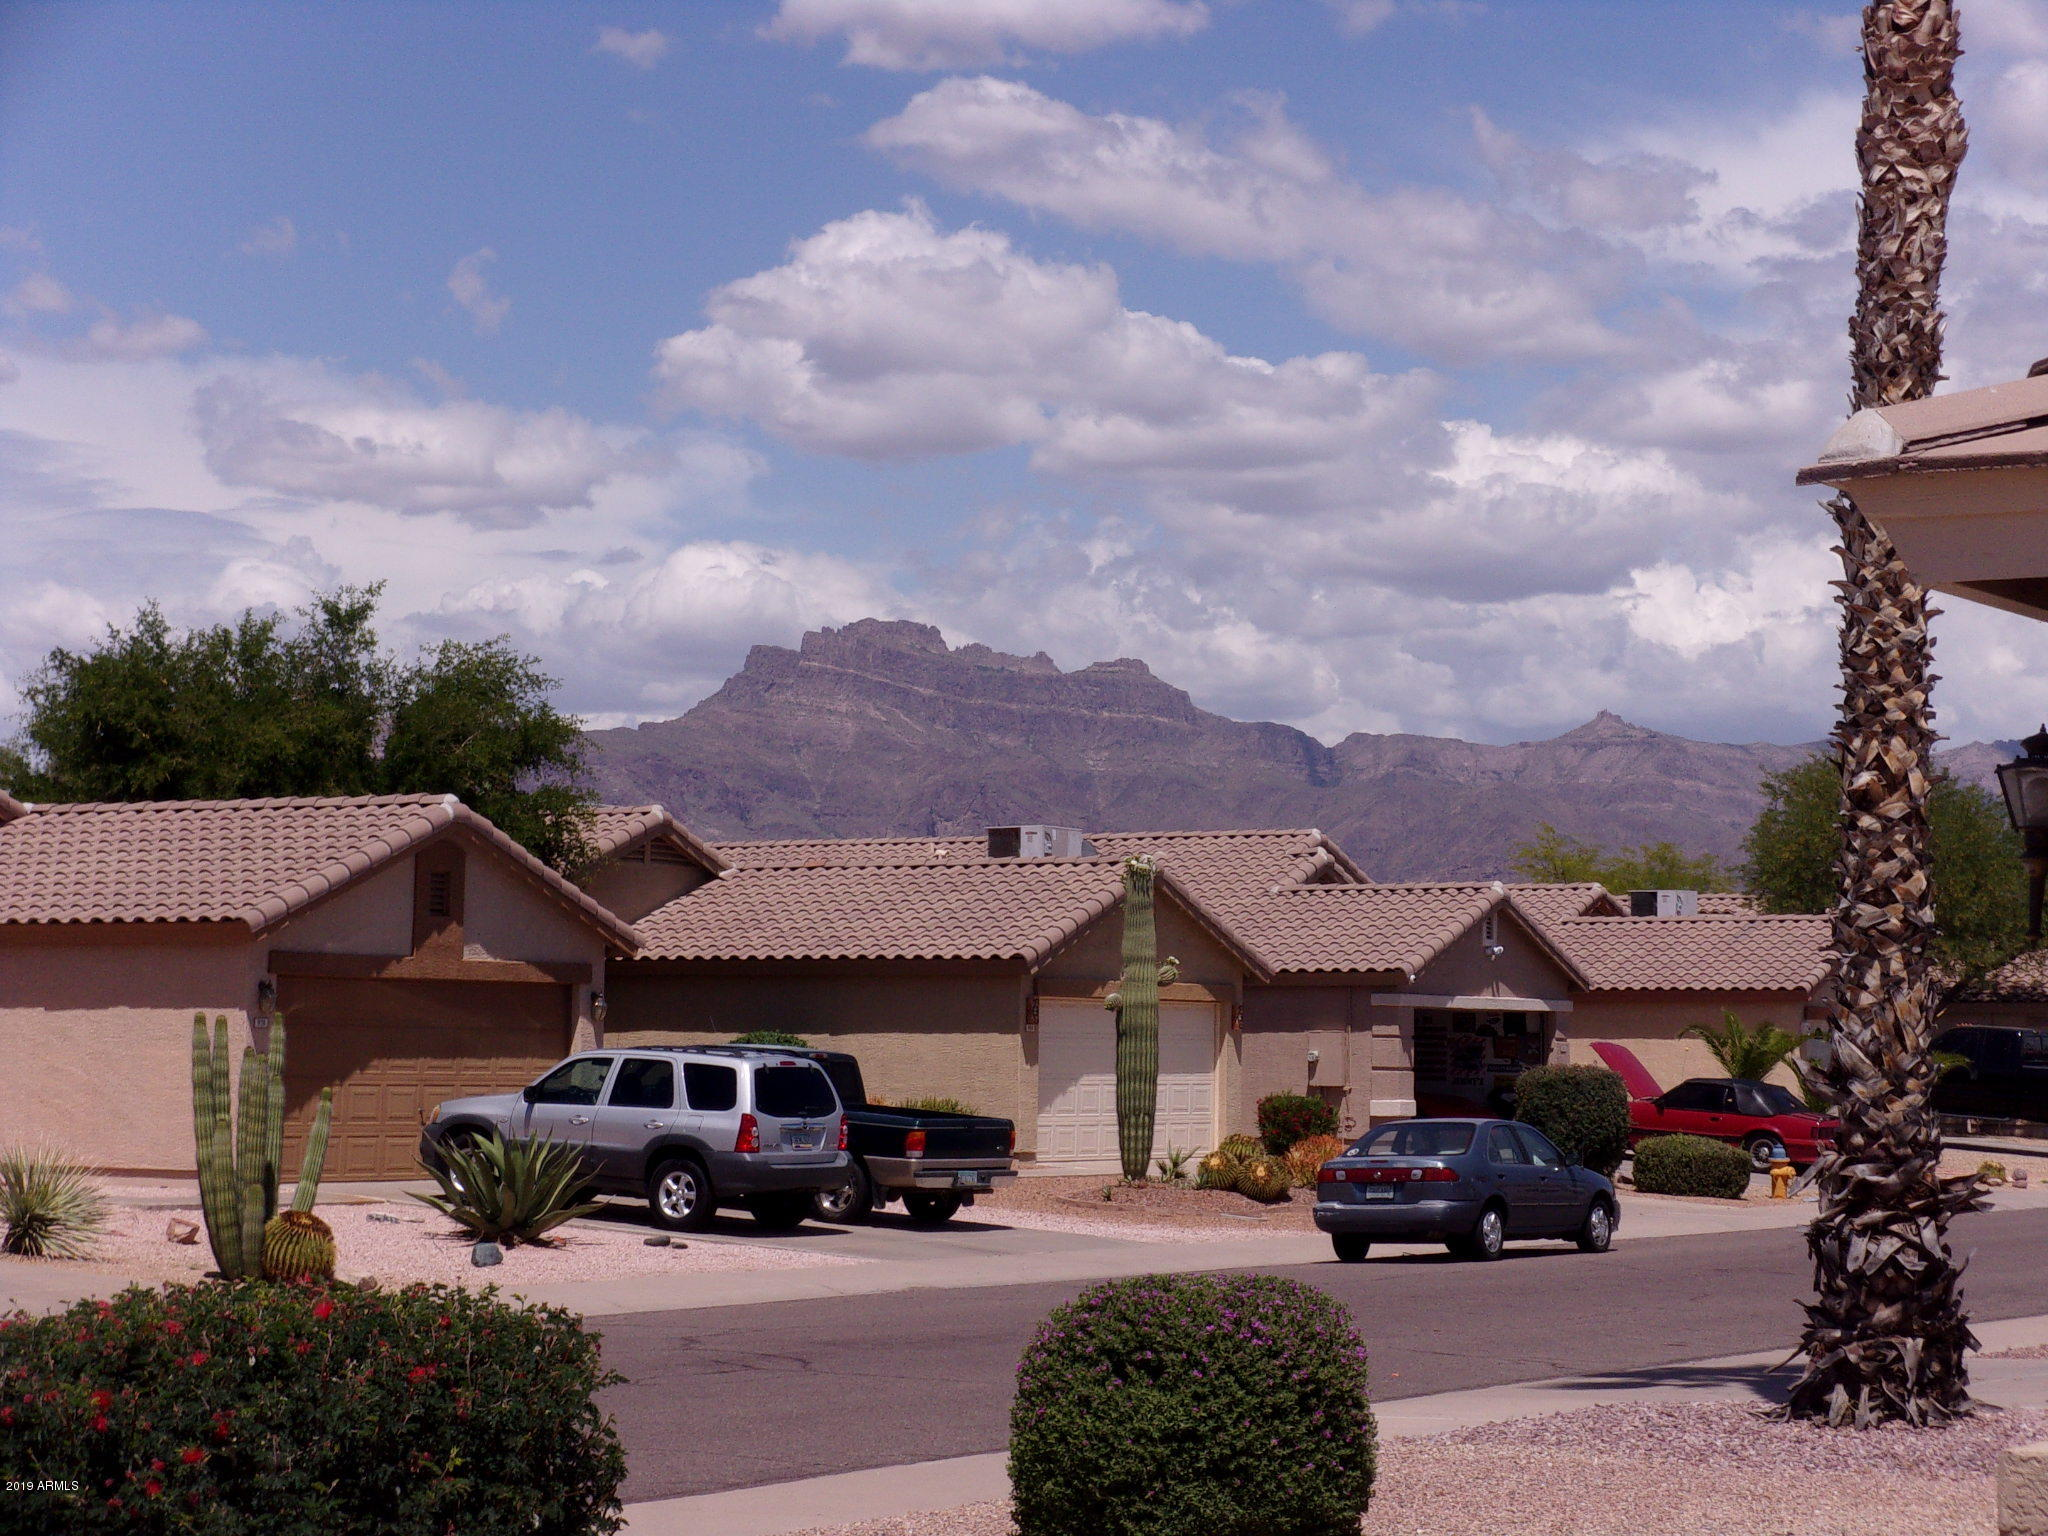 MLS 5924727 951 E GRAHAM Lane, Apache Junction, AZ 85119 Apache Junction AZ Condo or Townhome